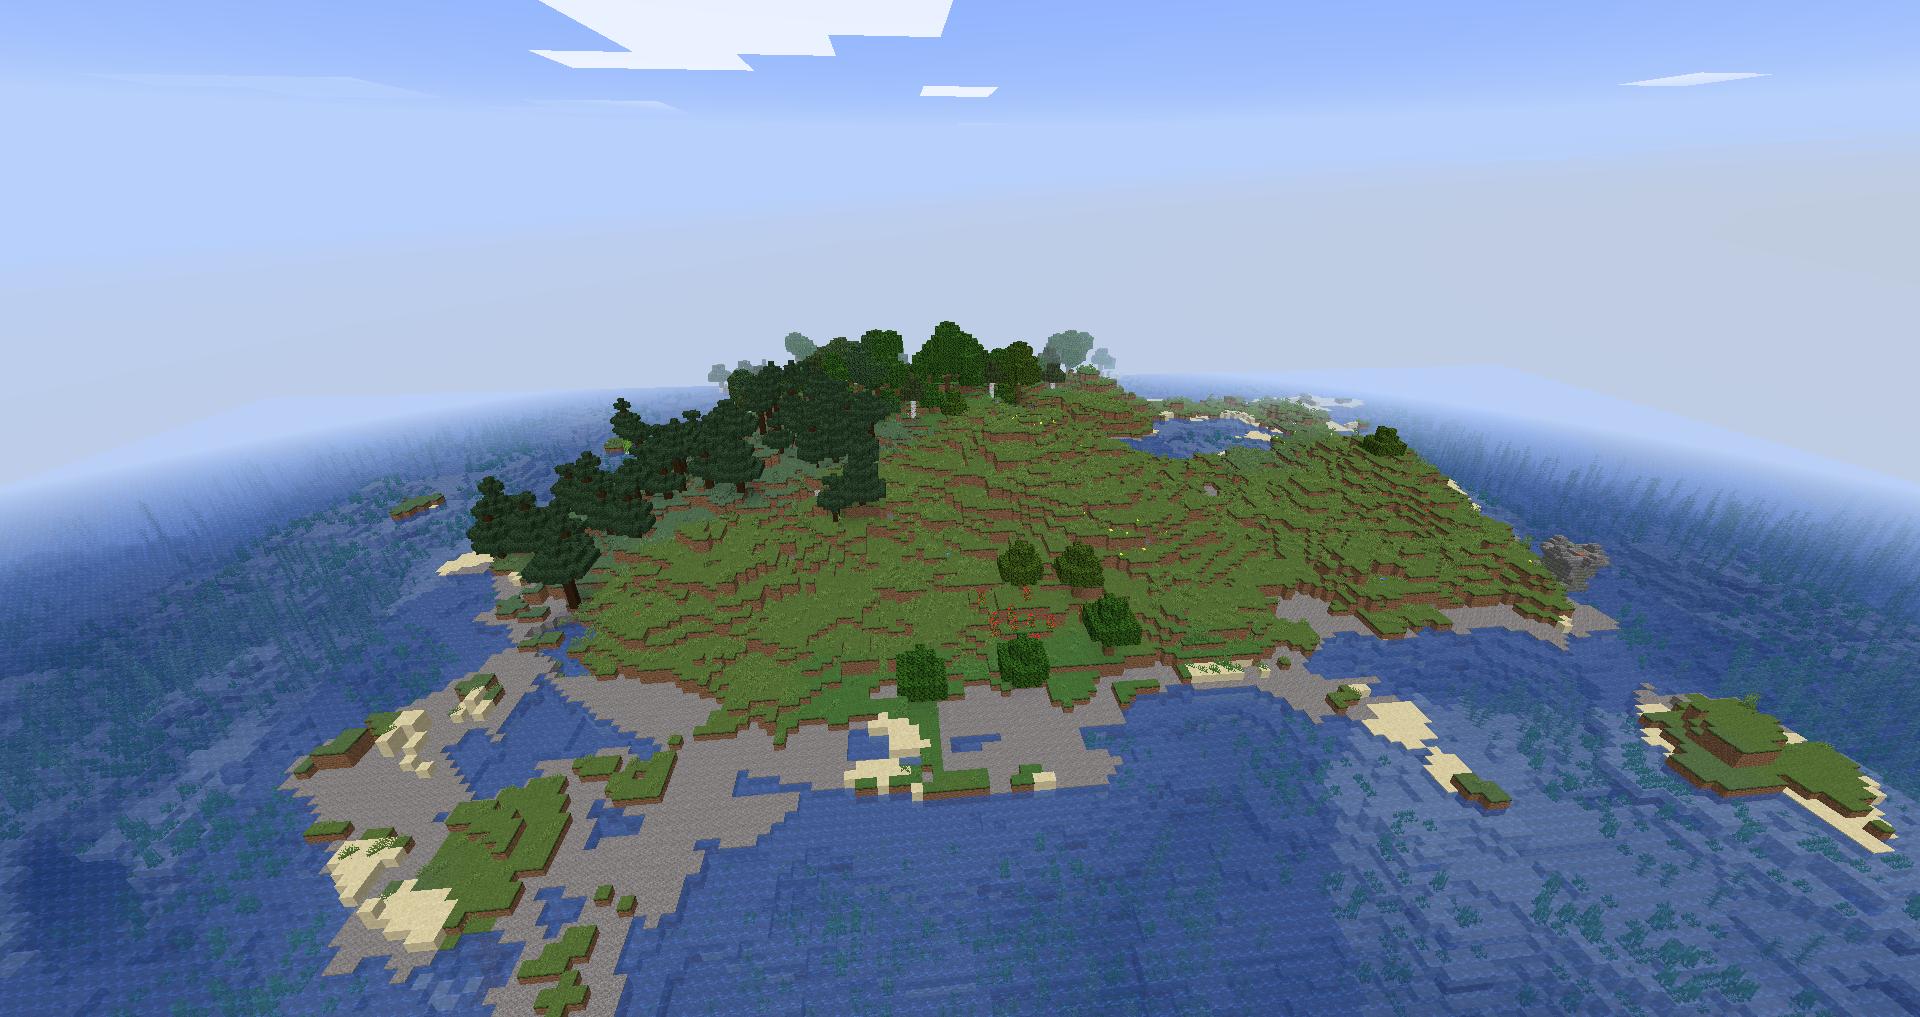 Indev Island